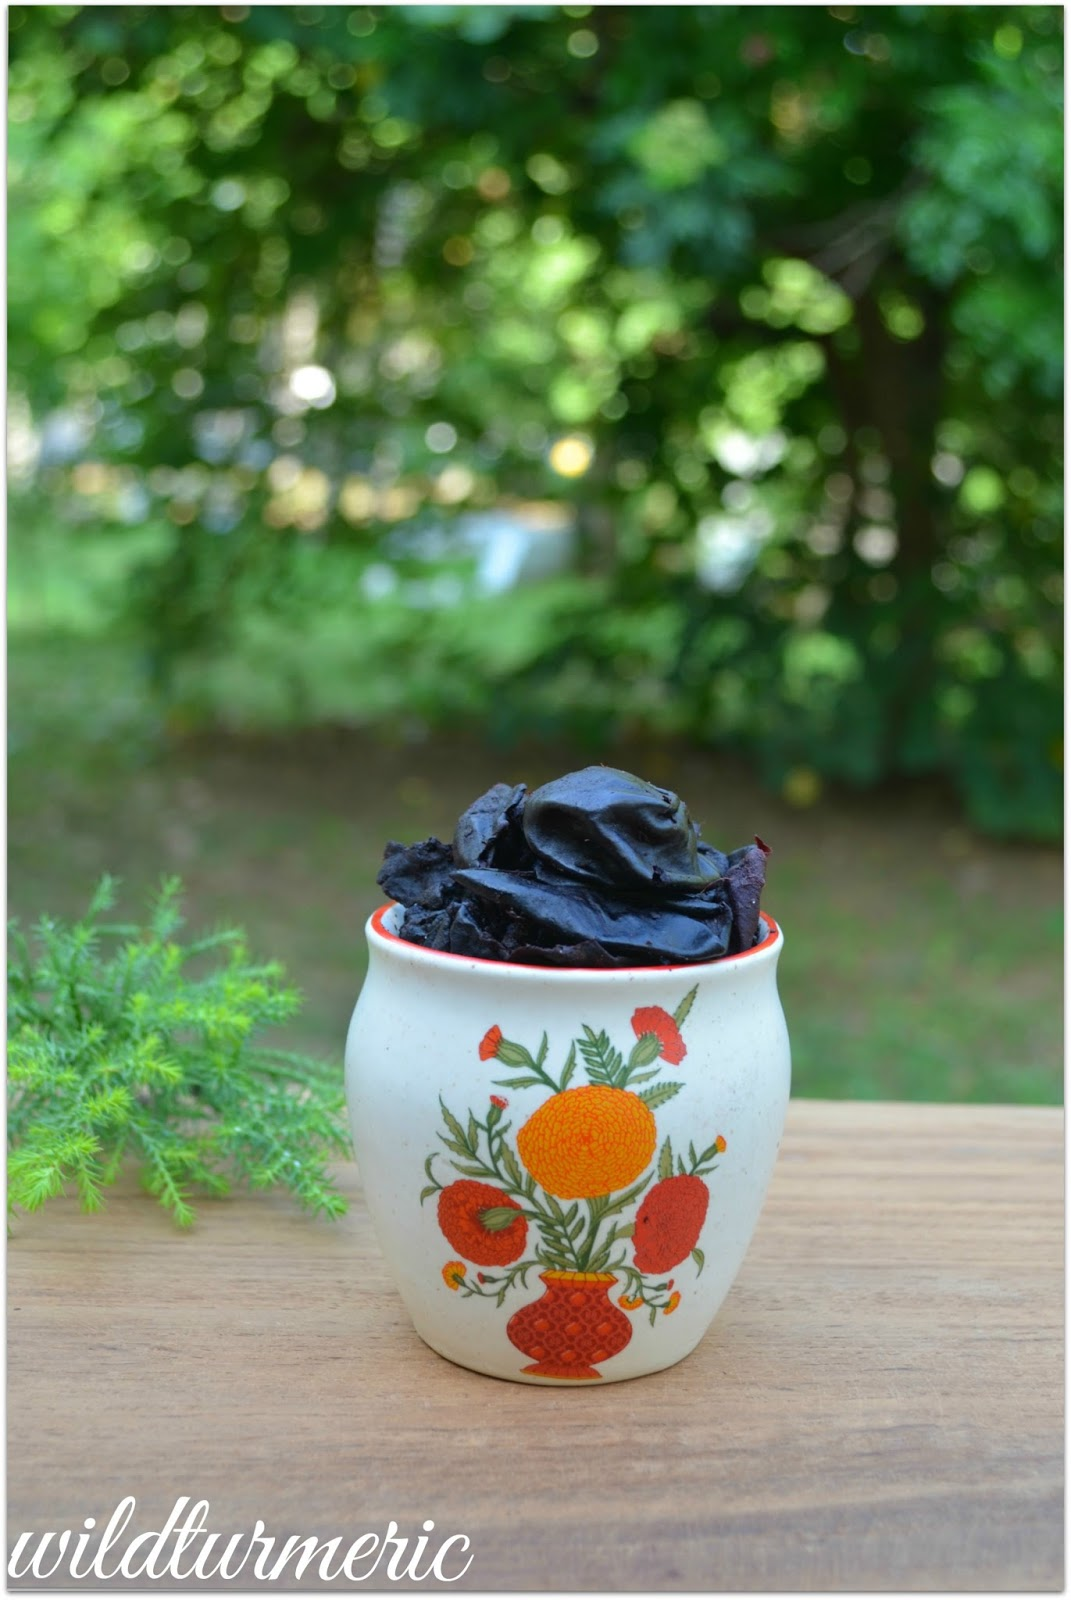 8 Top Medicinal Uses Of Kokum (Garcinia Indica) For Skin, Hair & Health